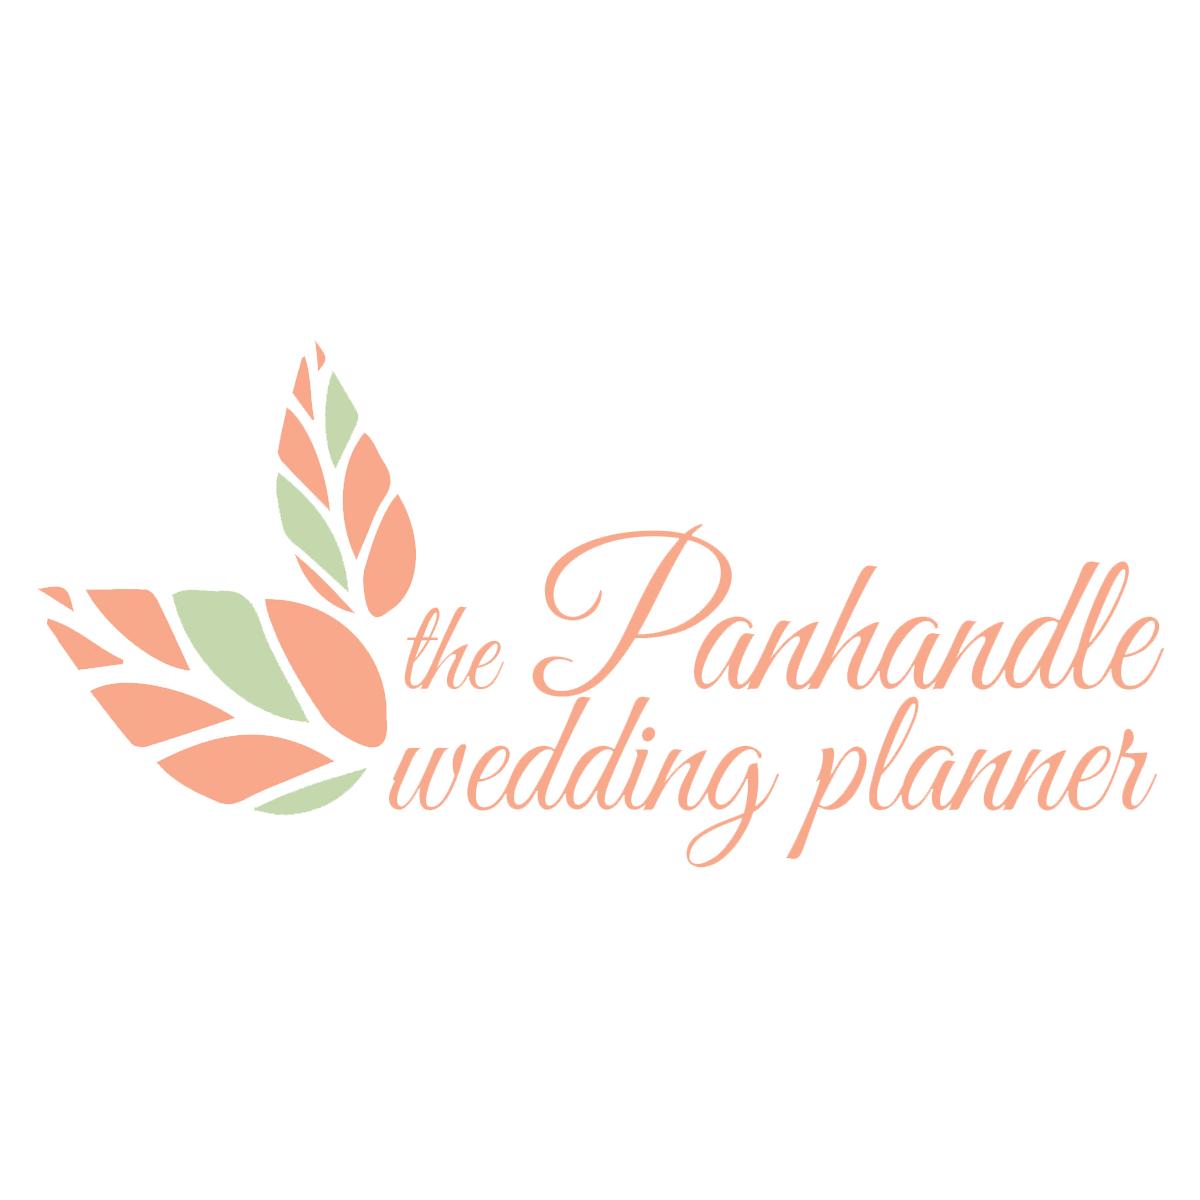 The Panhandle Wedding Planner